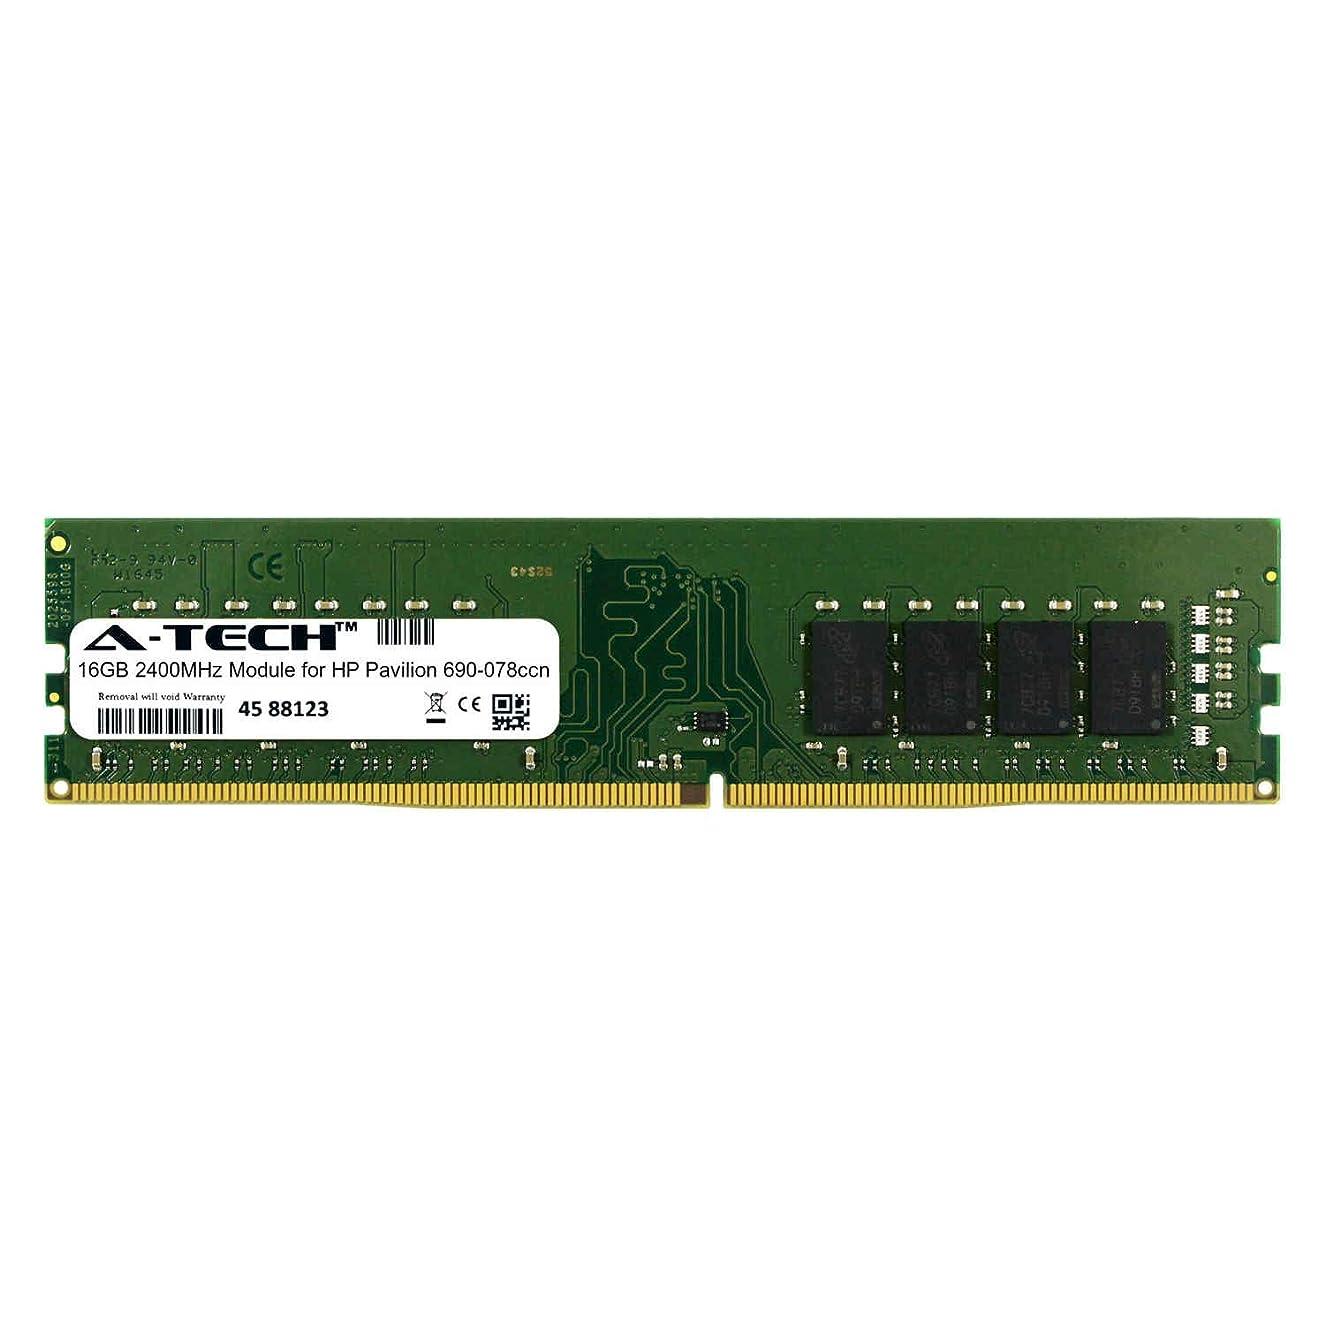 A-Tech 16GB Module for HP Pavilion 690-078ccn Desktop & Workstation Motherboard Compatible DDR4 2400Mhz Memory Ram (ATMS311752A25822X1)